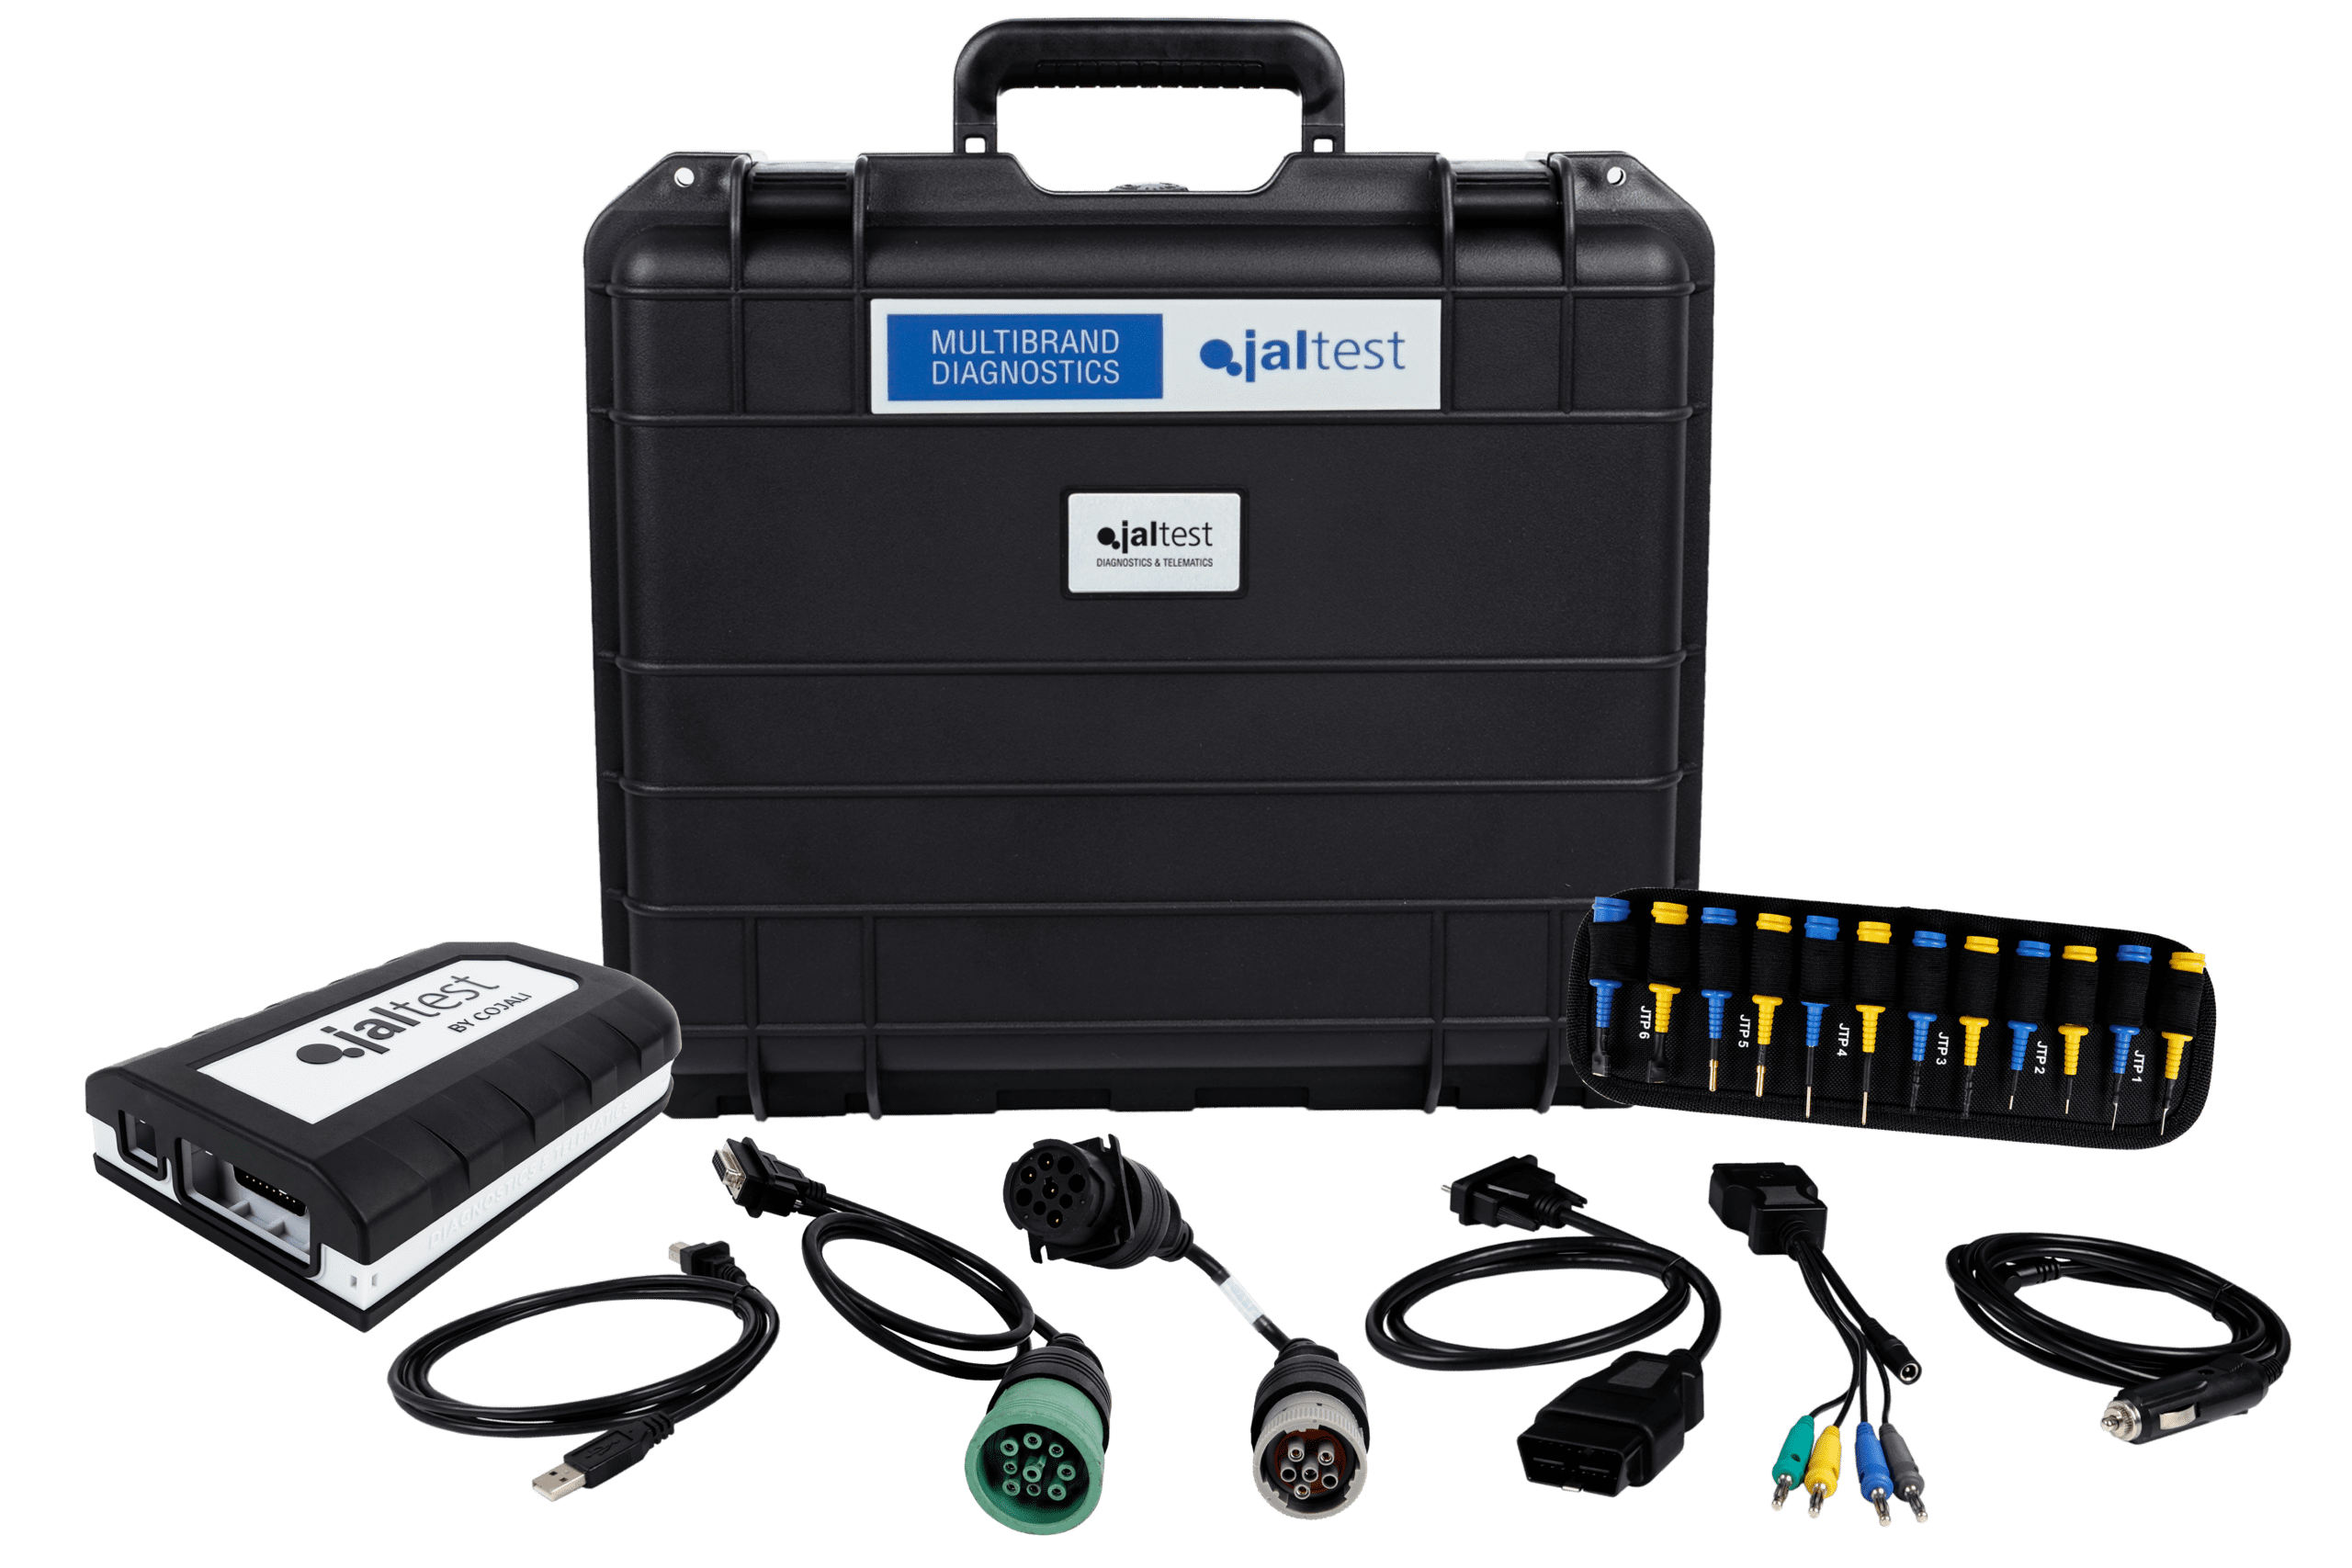 Jaltest Marine Full Diagnostic Software Adapter Kit TRI-MB-SWA